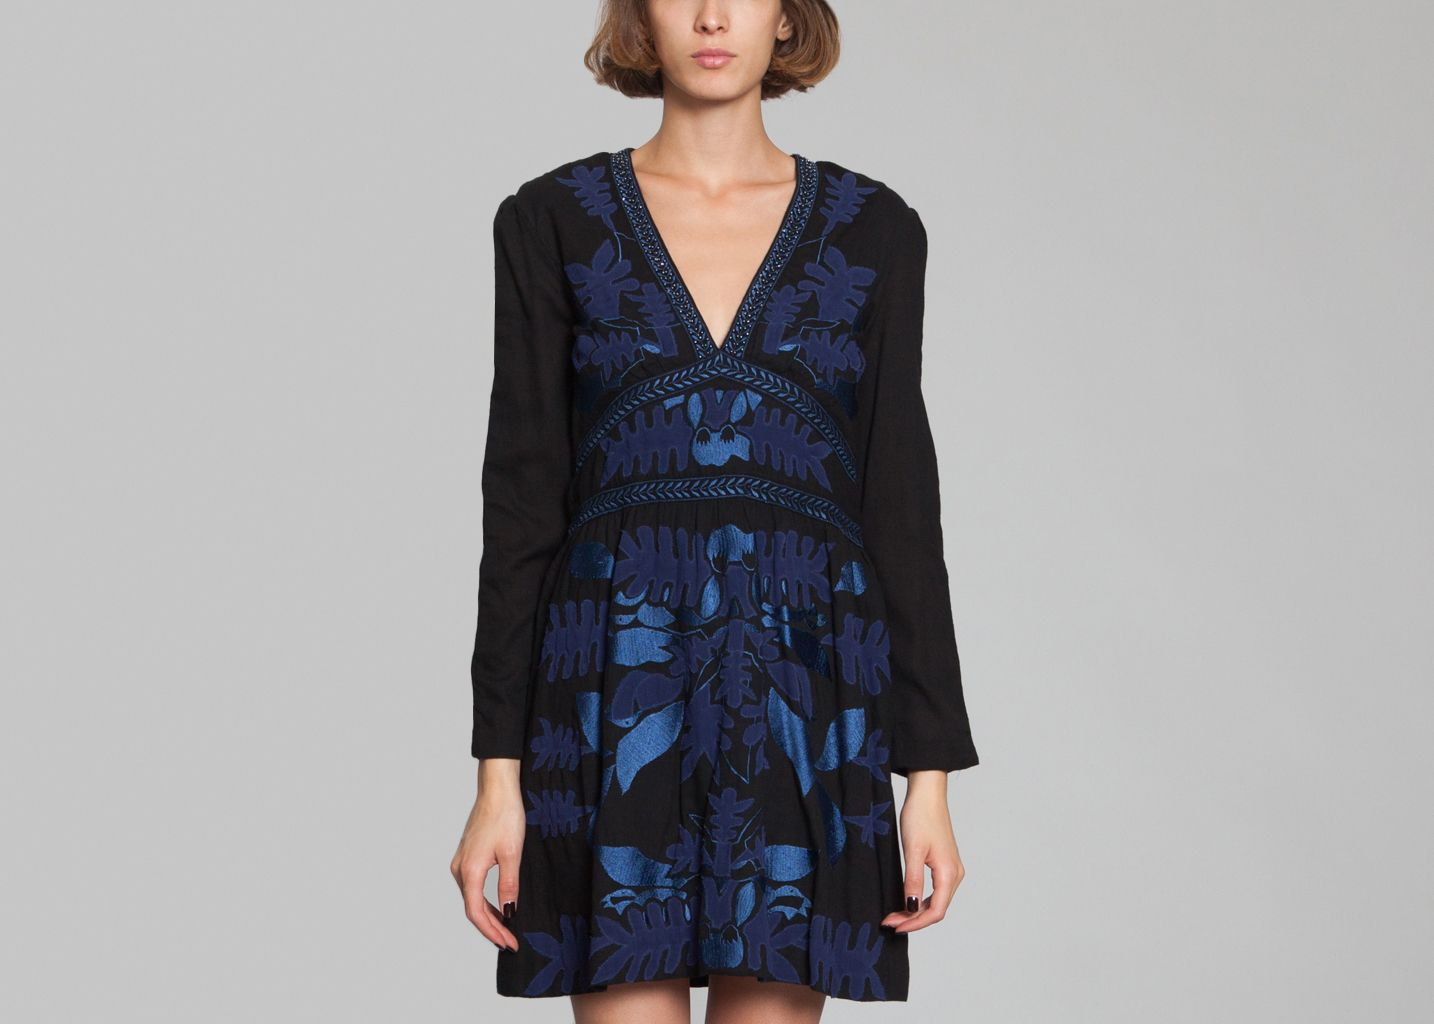 robe aga antik batik noir l 39 exception. Black Bedroom Furniture Sets. Home Design Ideas